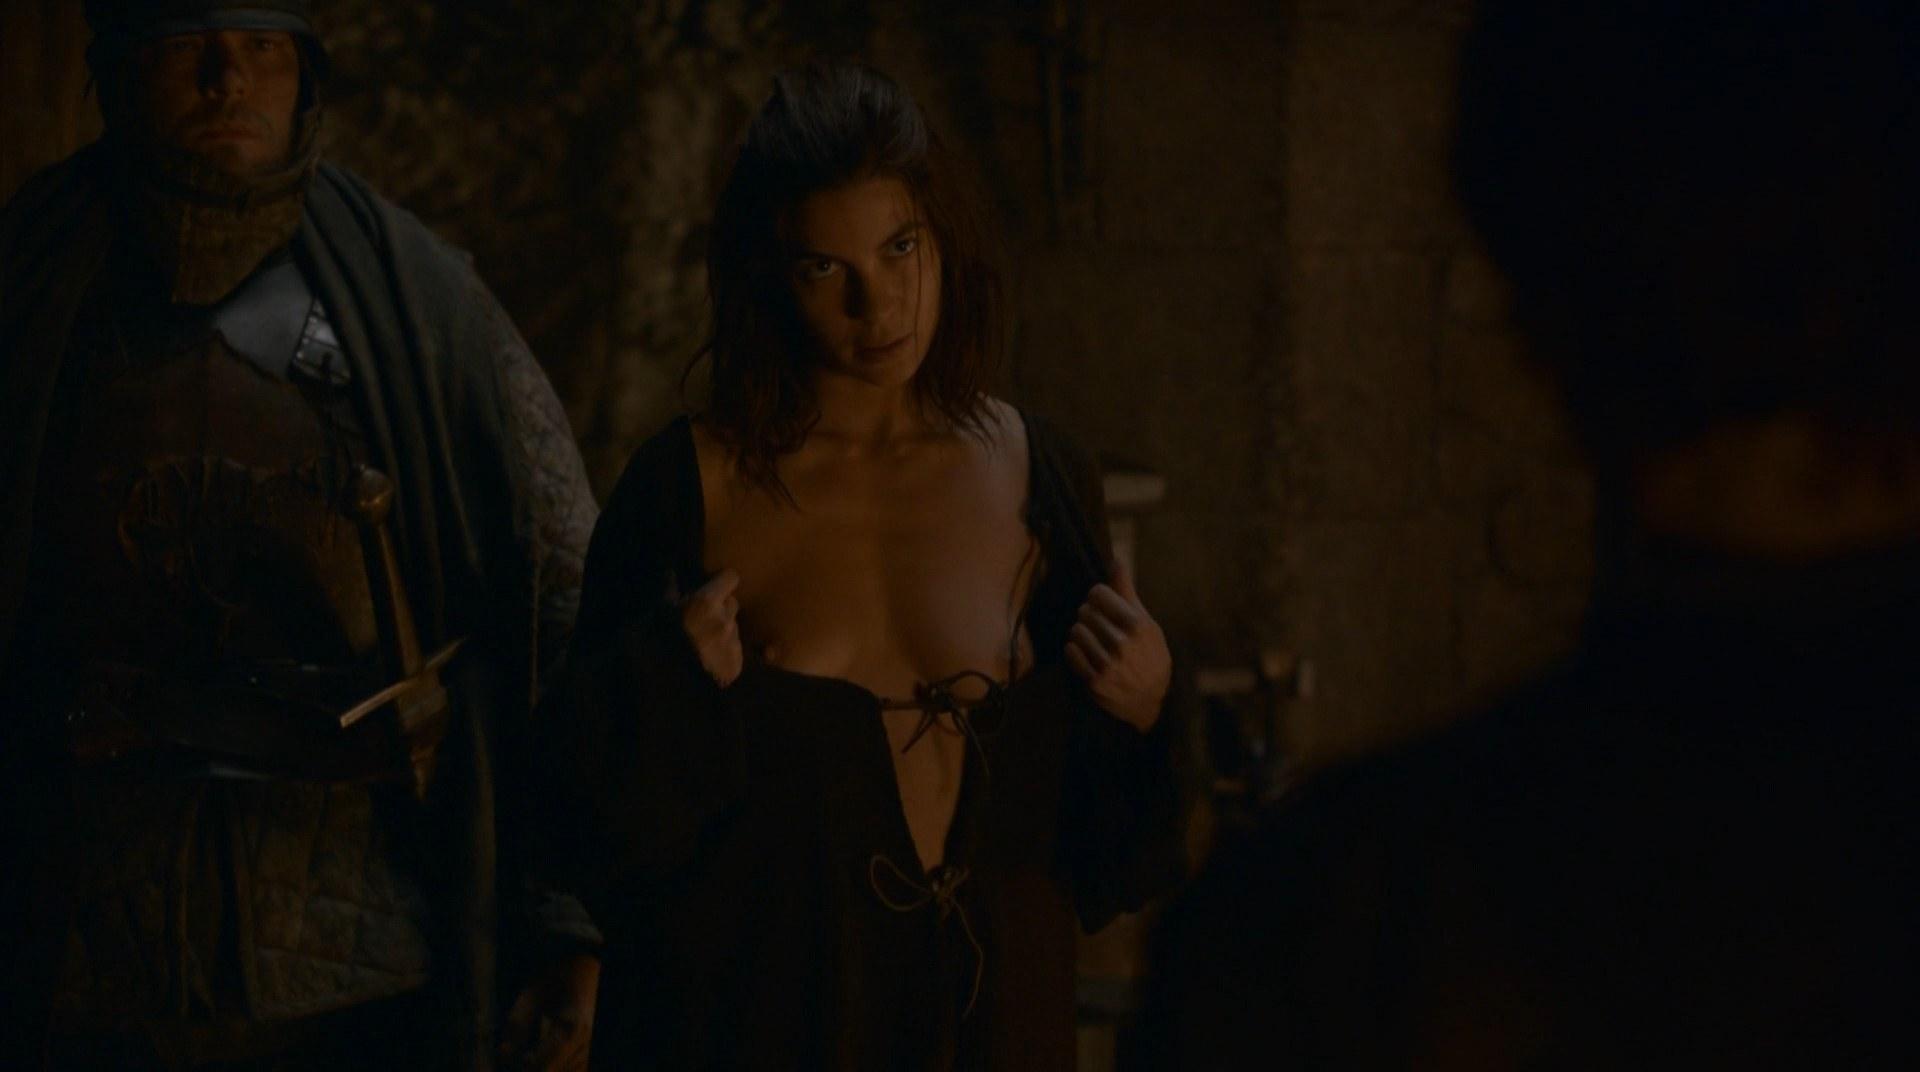 Game of Thrones – Season 2 (2012)